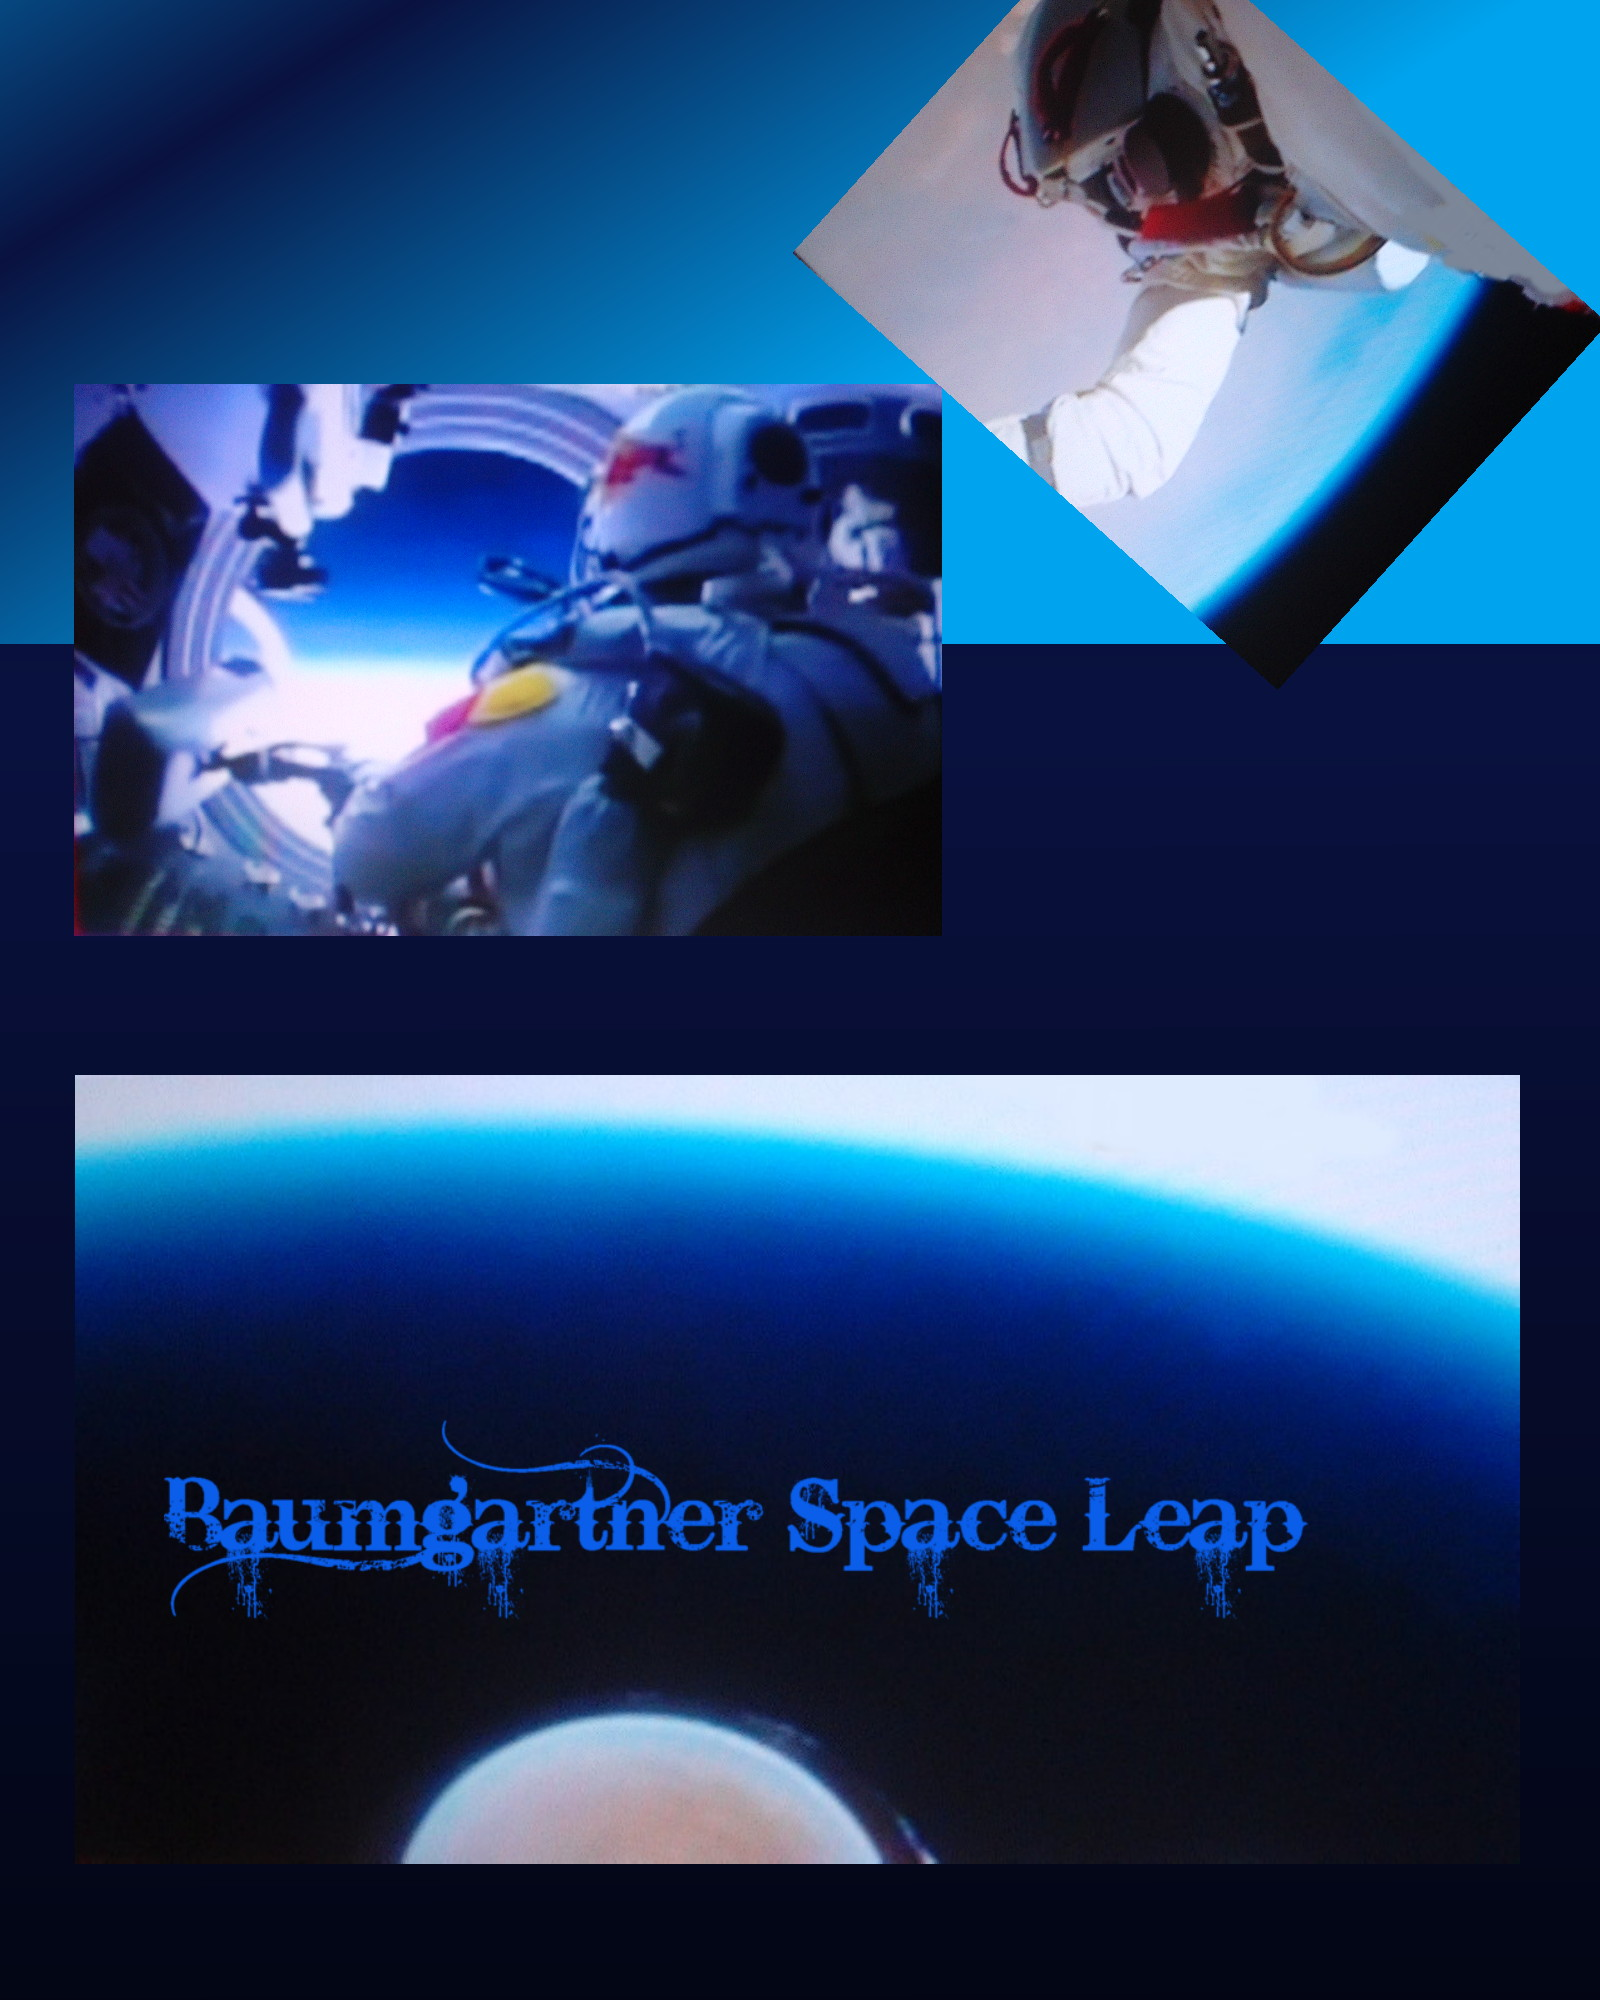 Baumgartner Record leap page